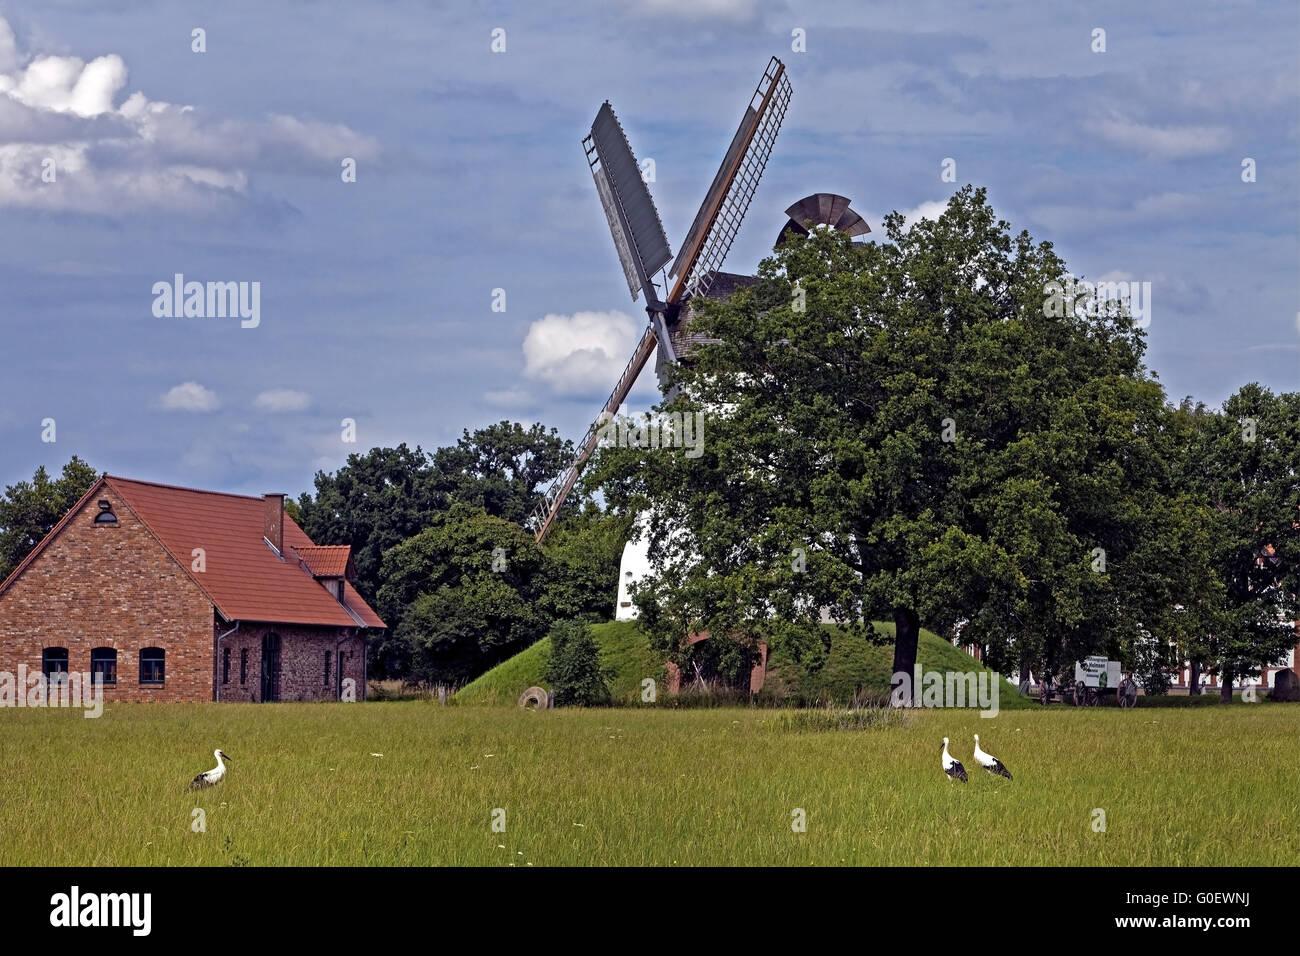 windmill Heimsen, Petershagen, Germany - Stock Image